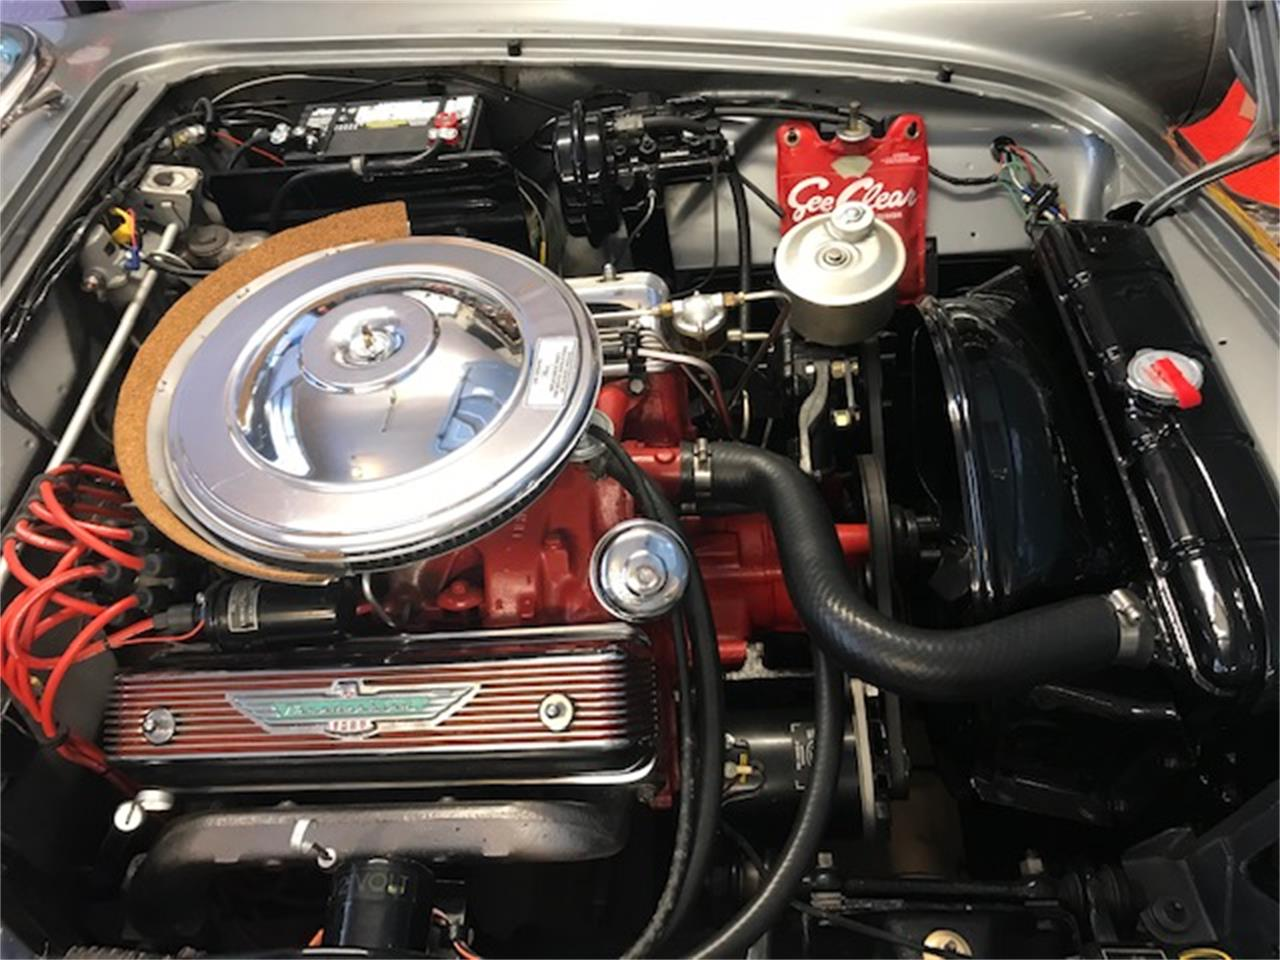 1957 Ford Thunderbird for Sale | ClassicCars.com | CC-1160117